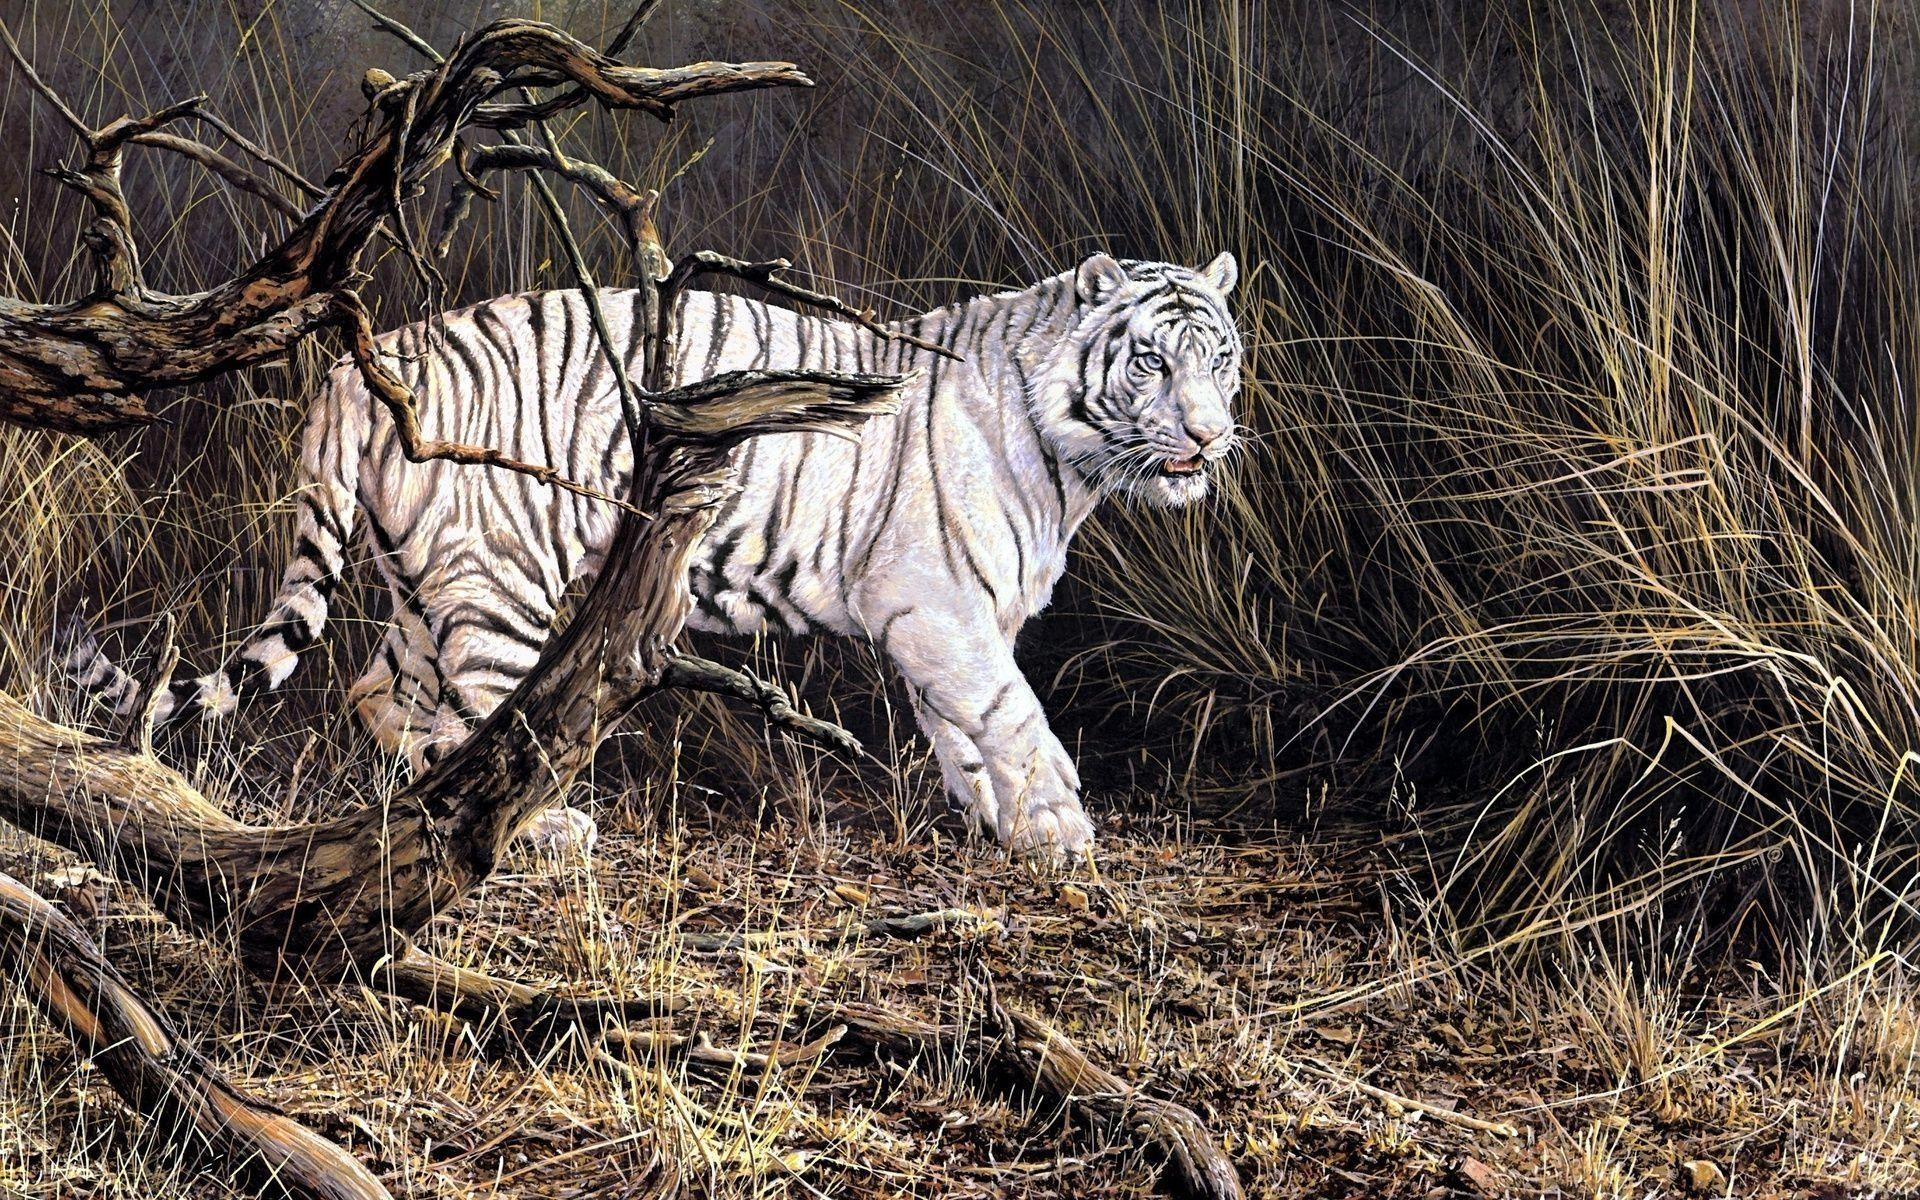 White Tiger Art, Wallpaper